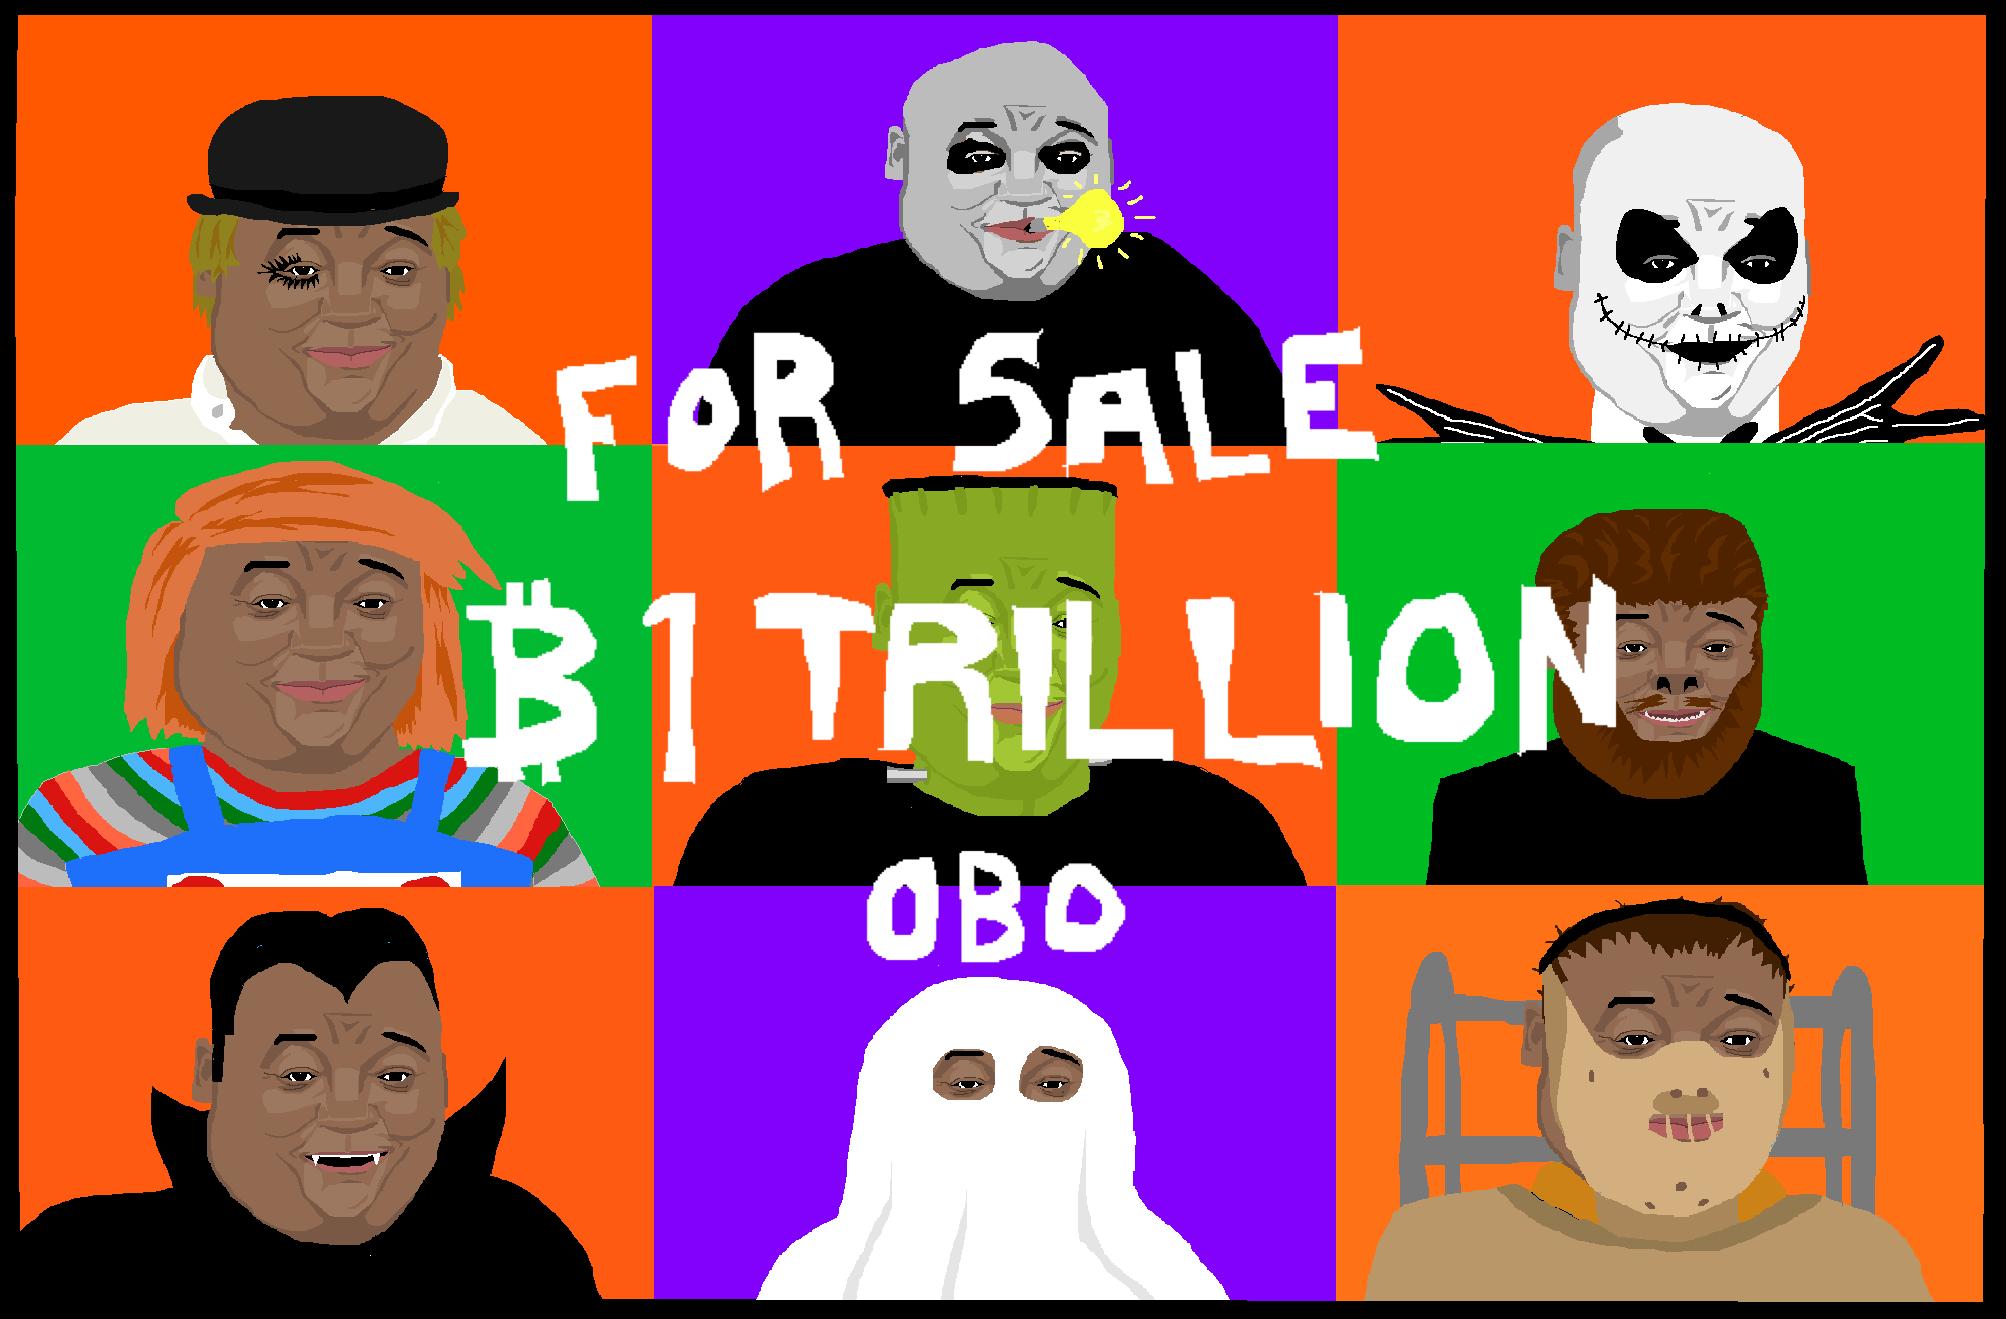 Artwork worth one trillion dollars.